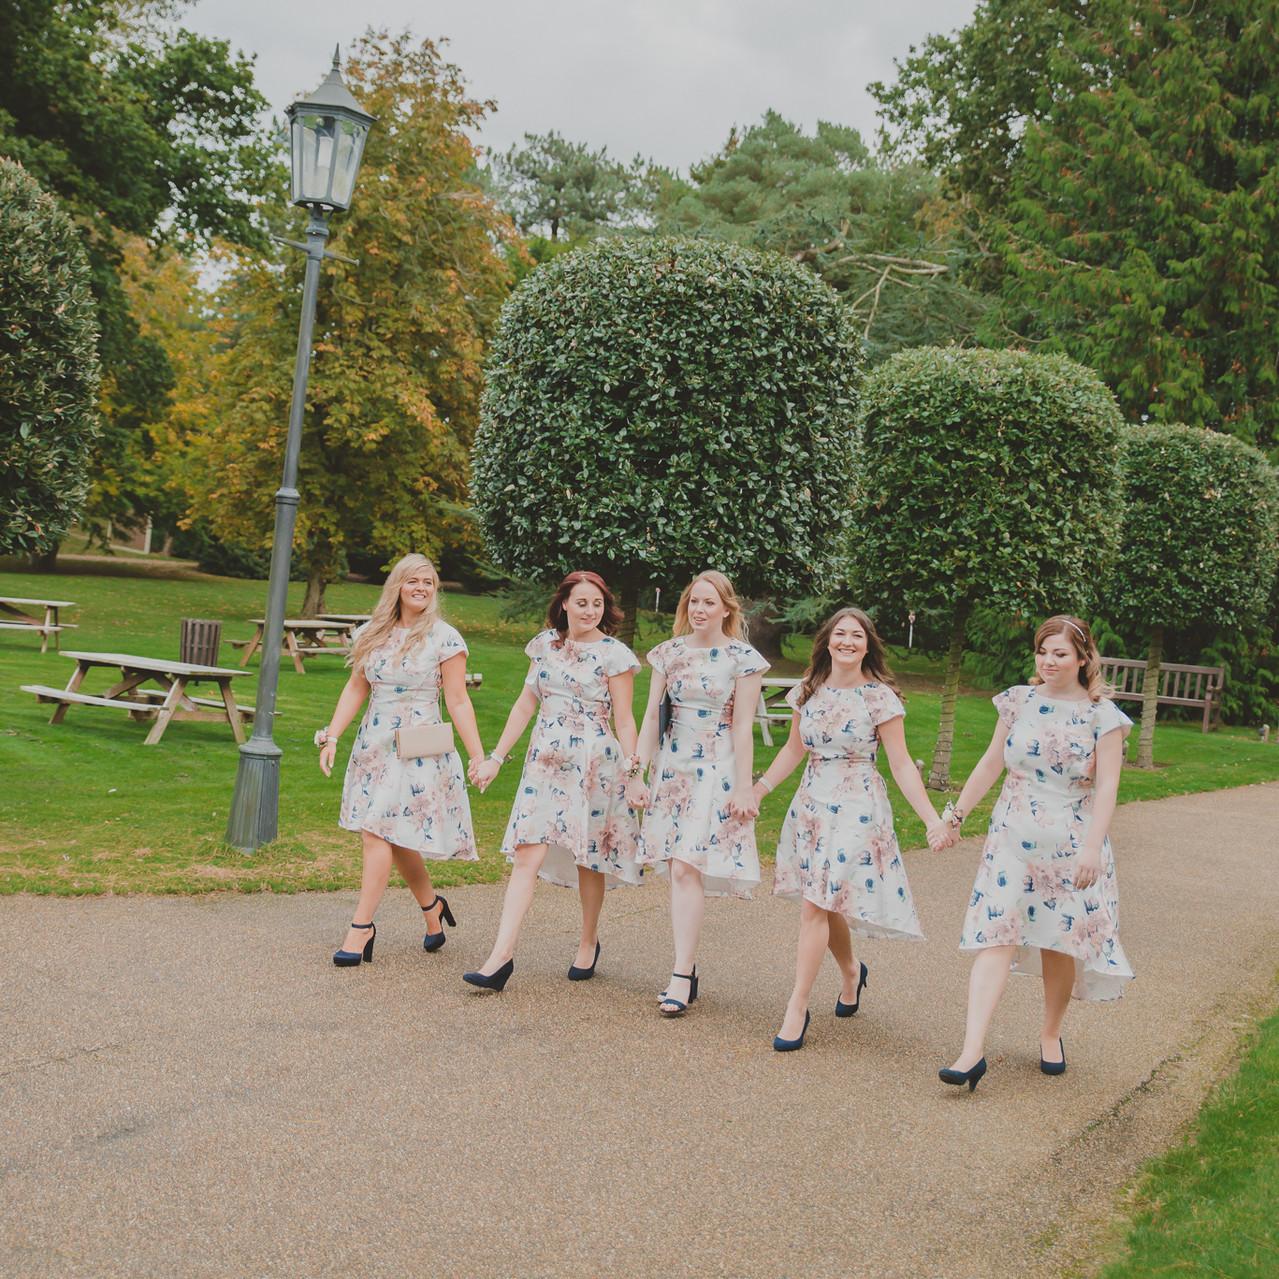 Fay Wedding - Thursford Collection at the Garden Pavilion, Norfolk. Walking Bridesmaids